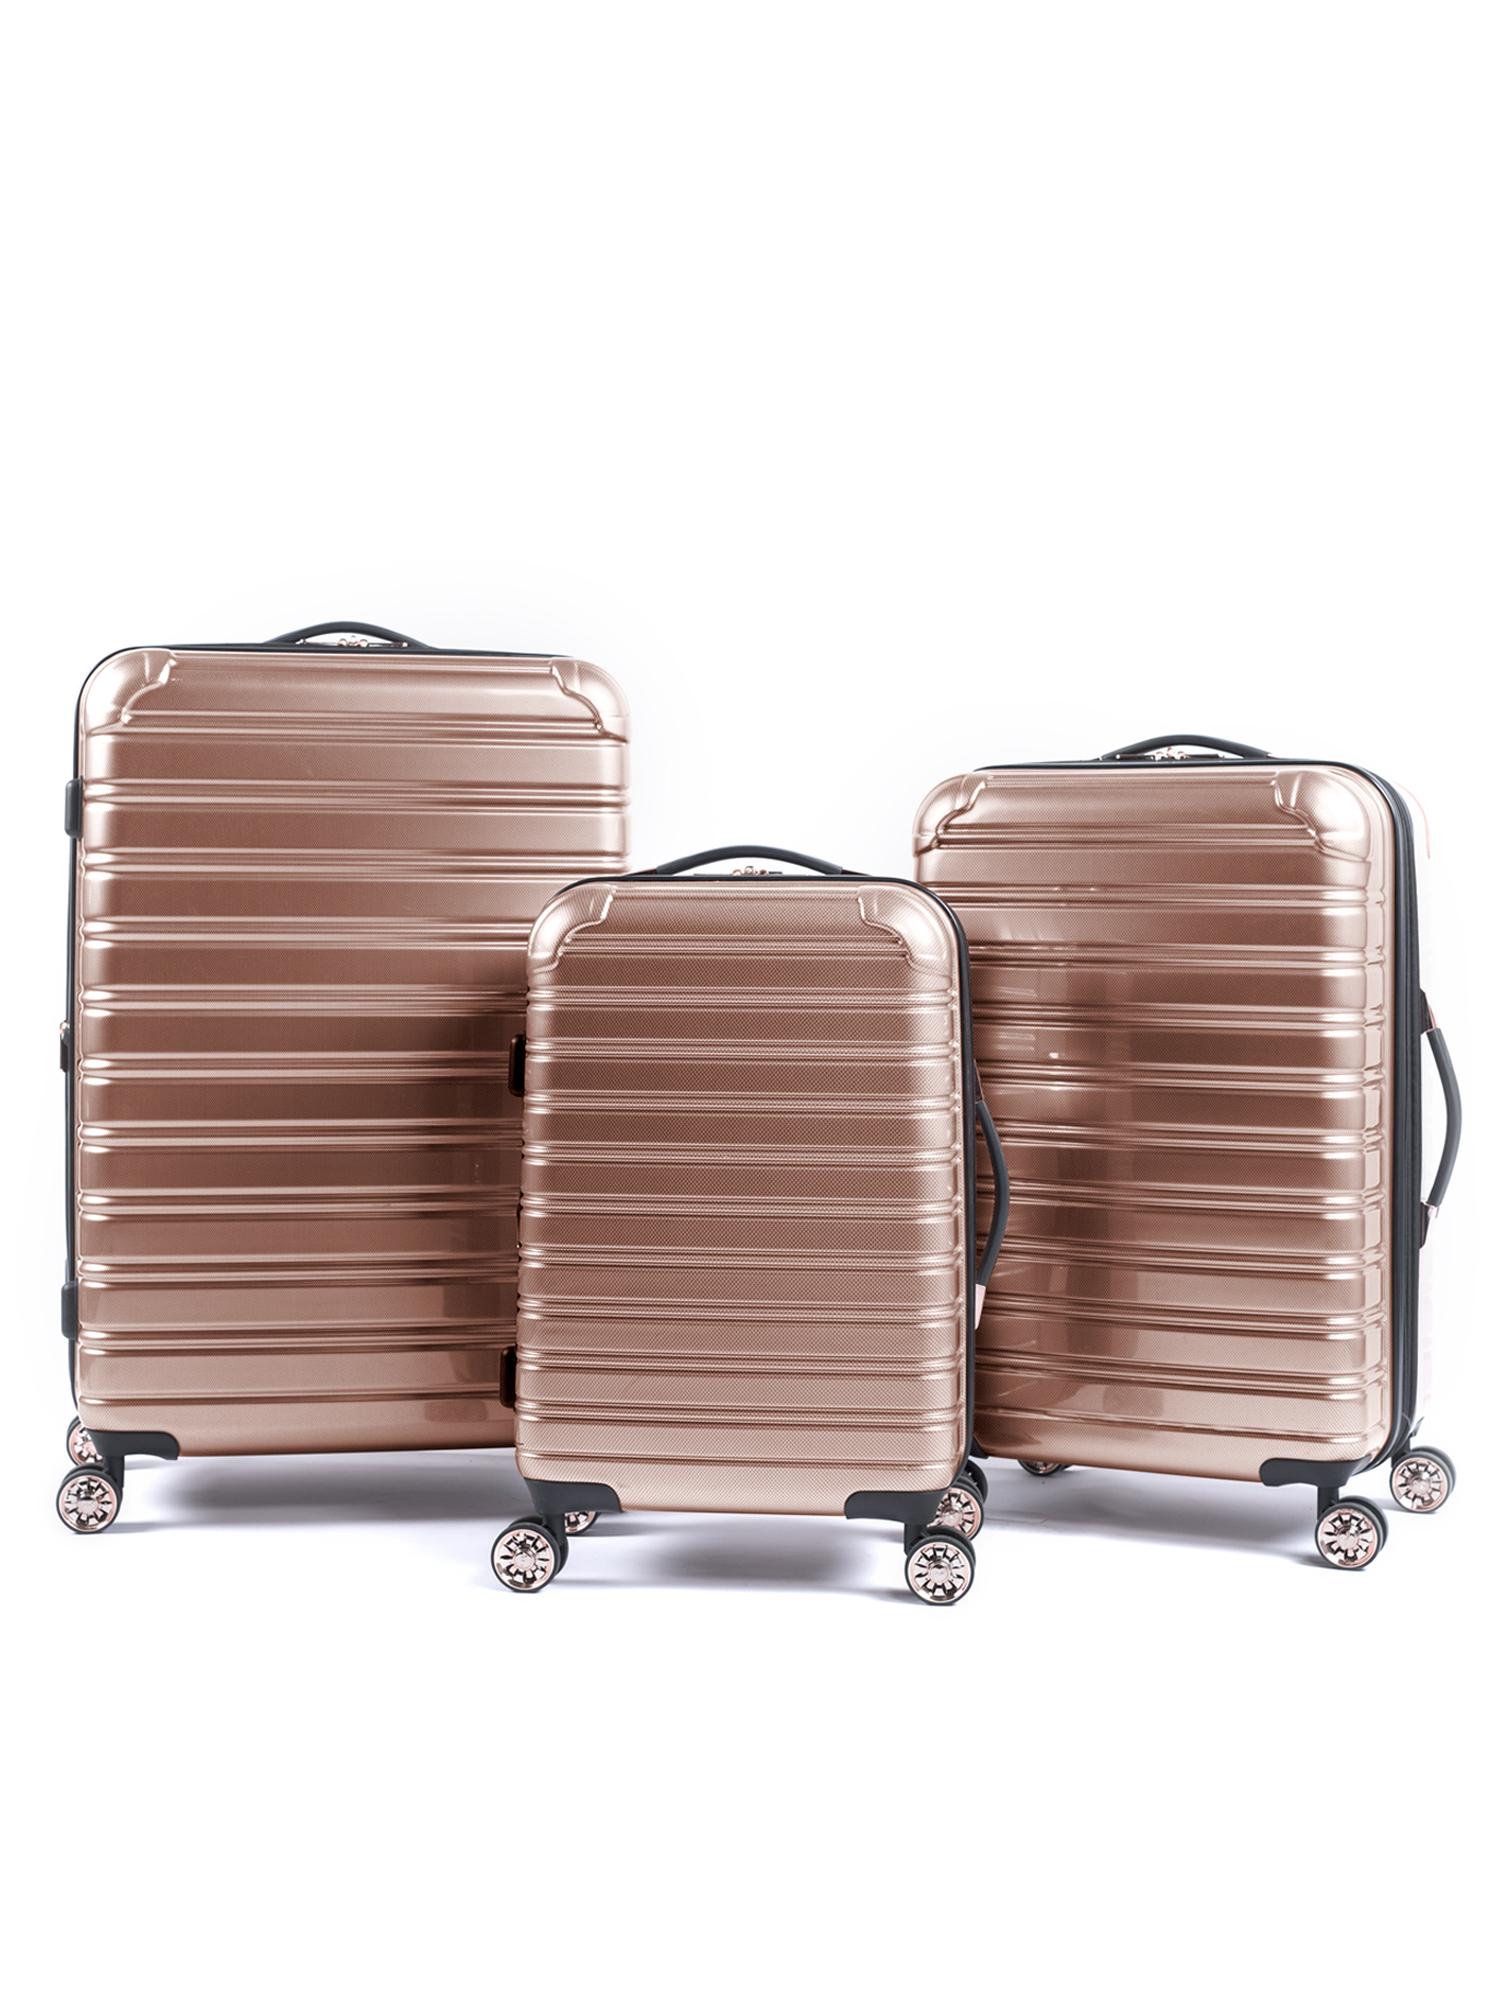 iFLY Hardside Fibertech 3 Piece Luggage Set